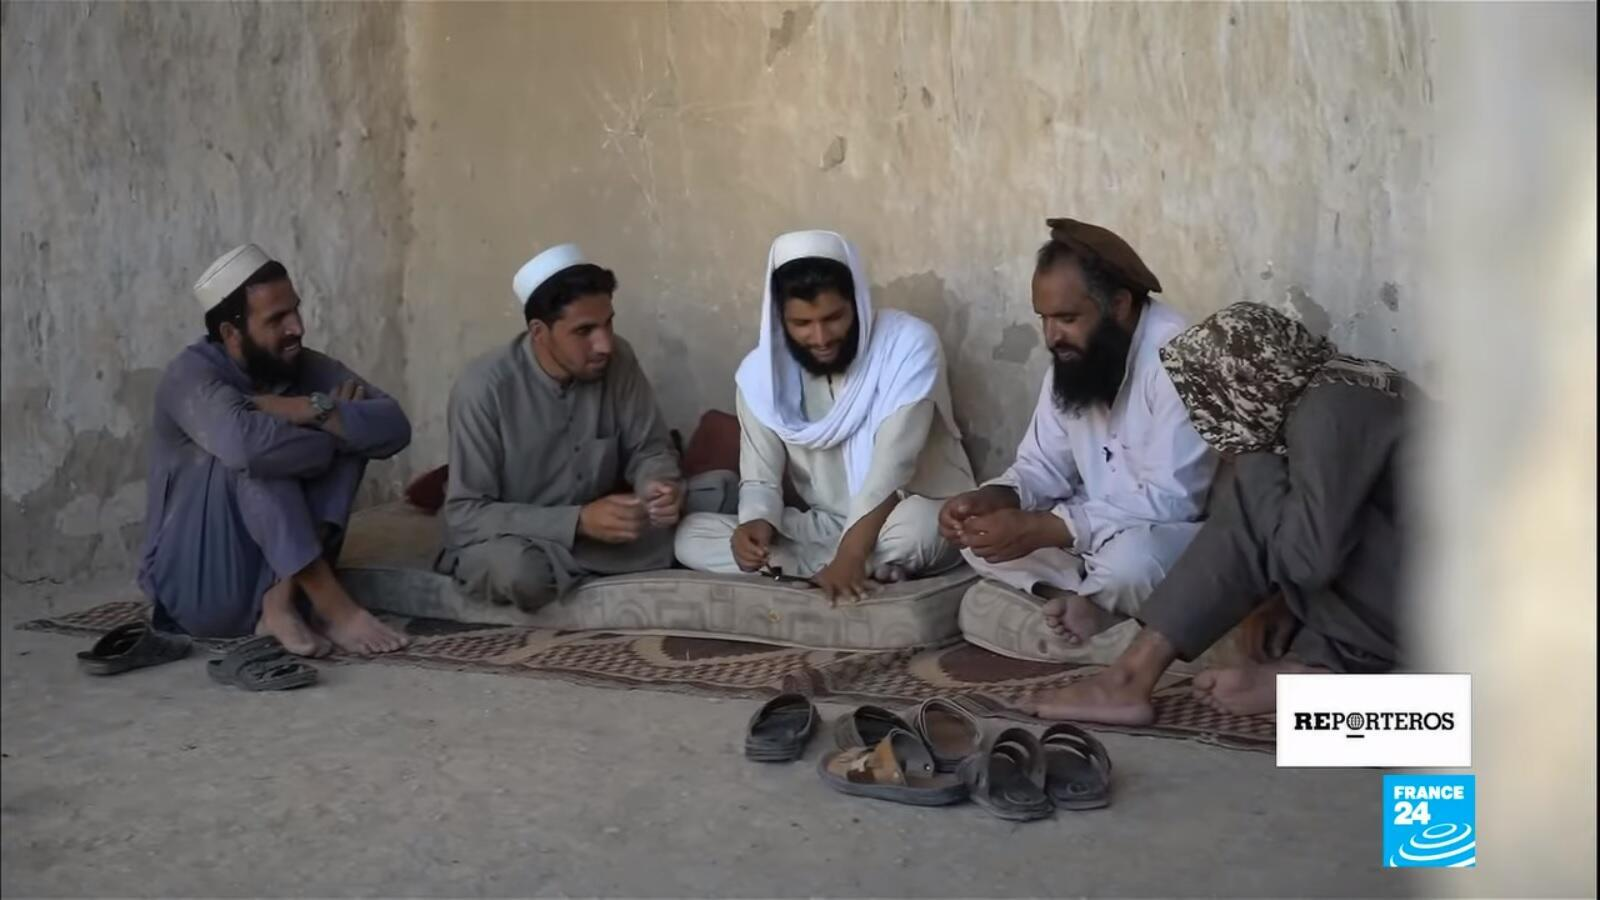 Reporteros taliban